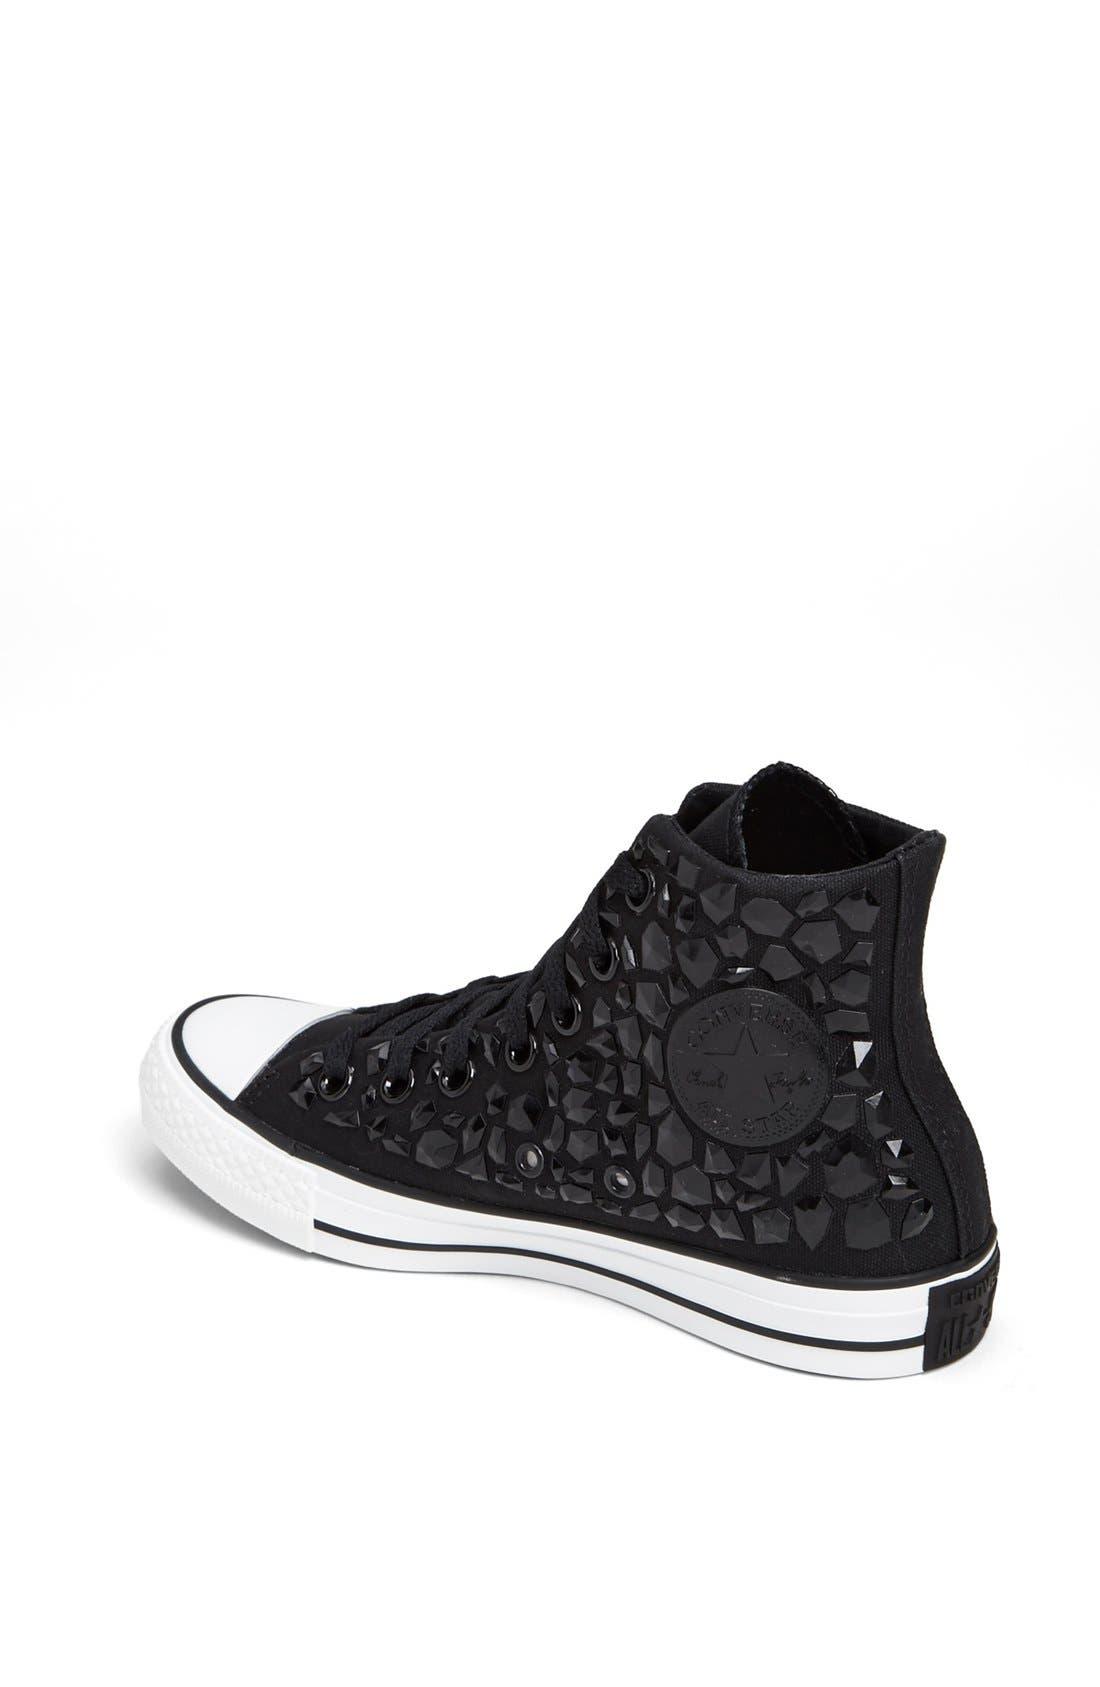 Alternate Image 2  - Converse Chuck Taylor® All Star® 'Rhinestone' High Top Sneaker (Women)